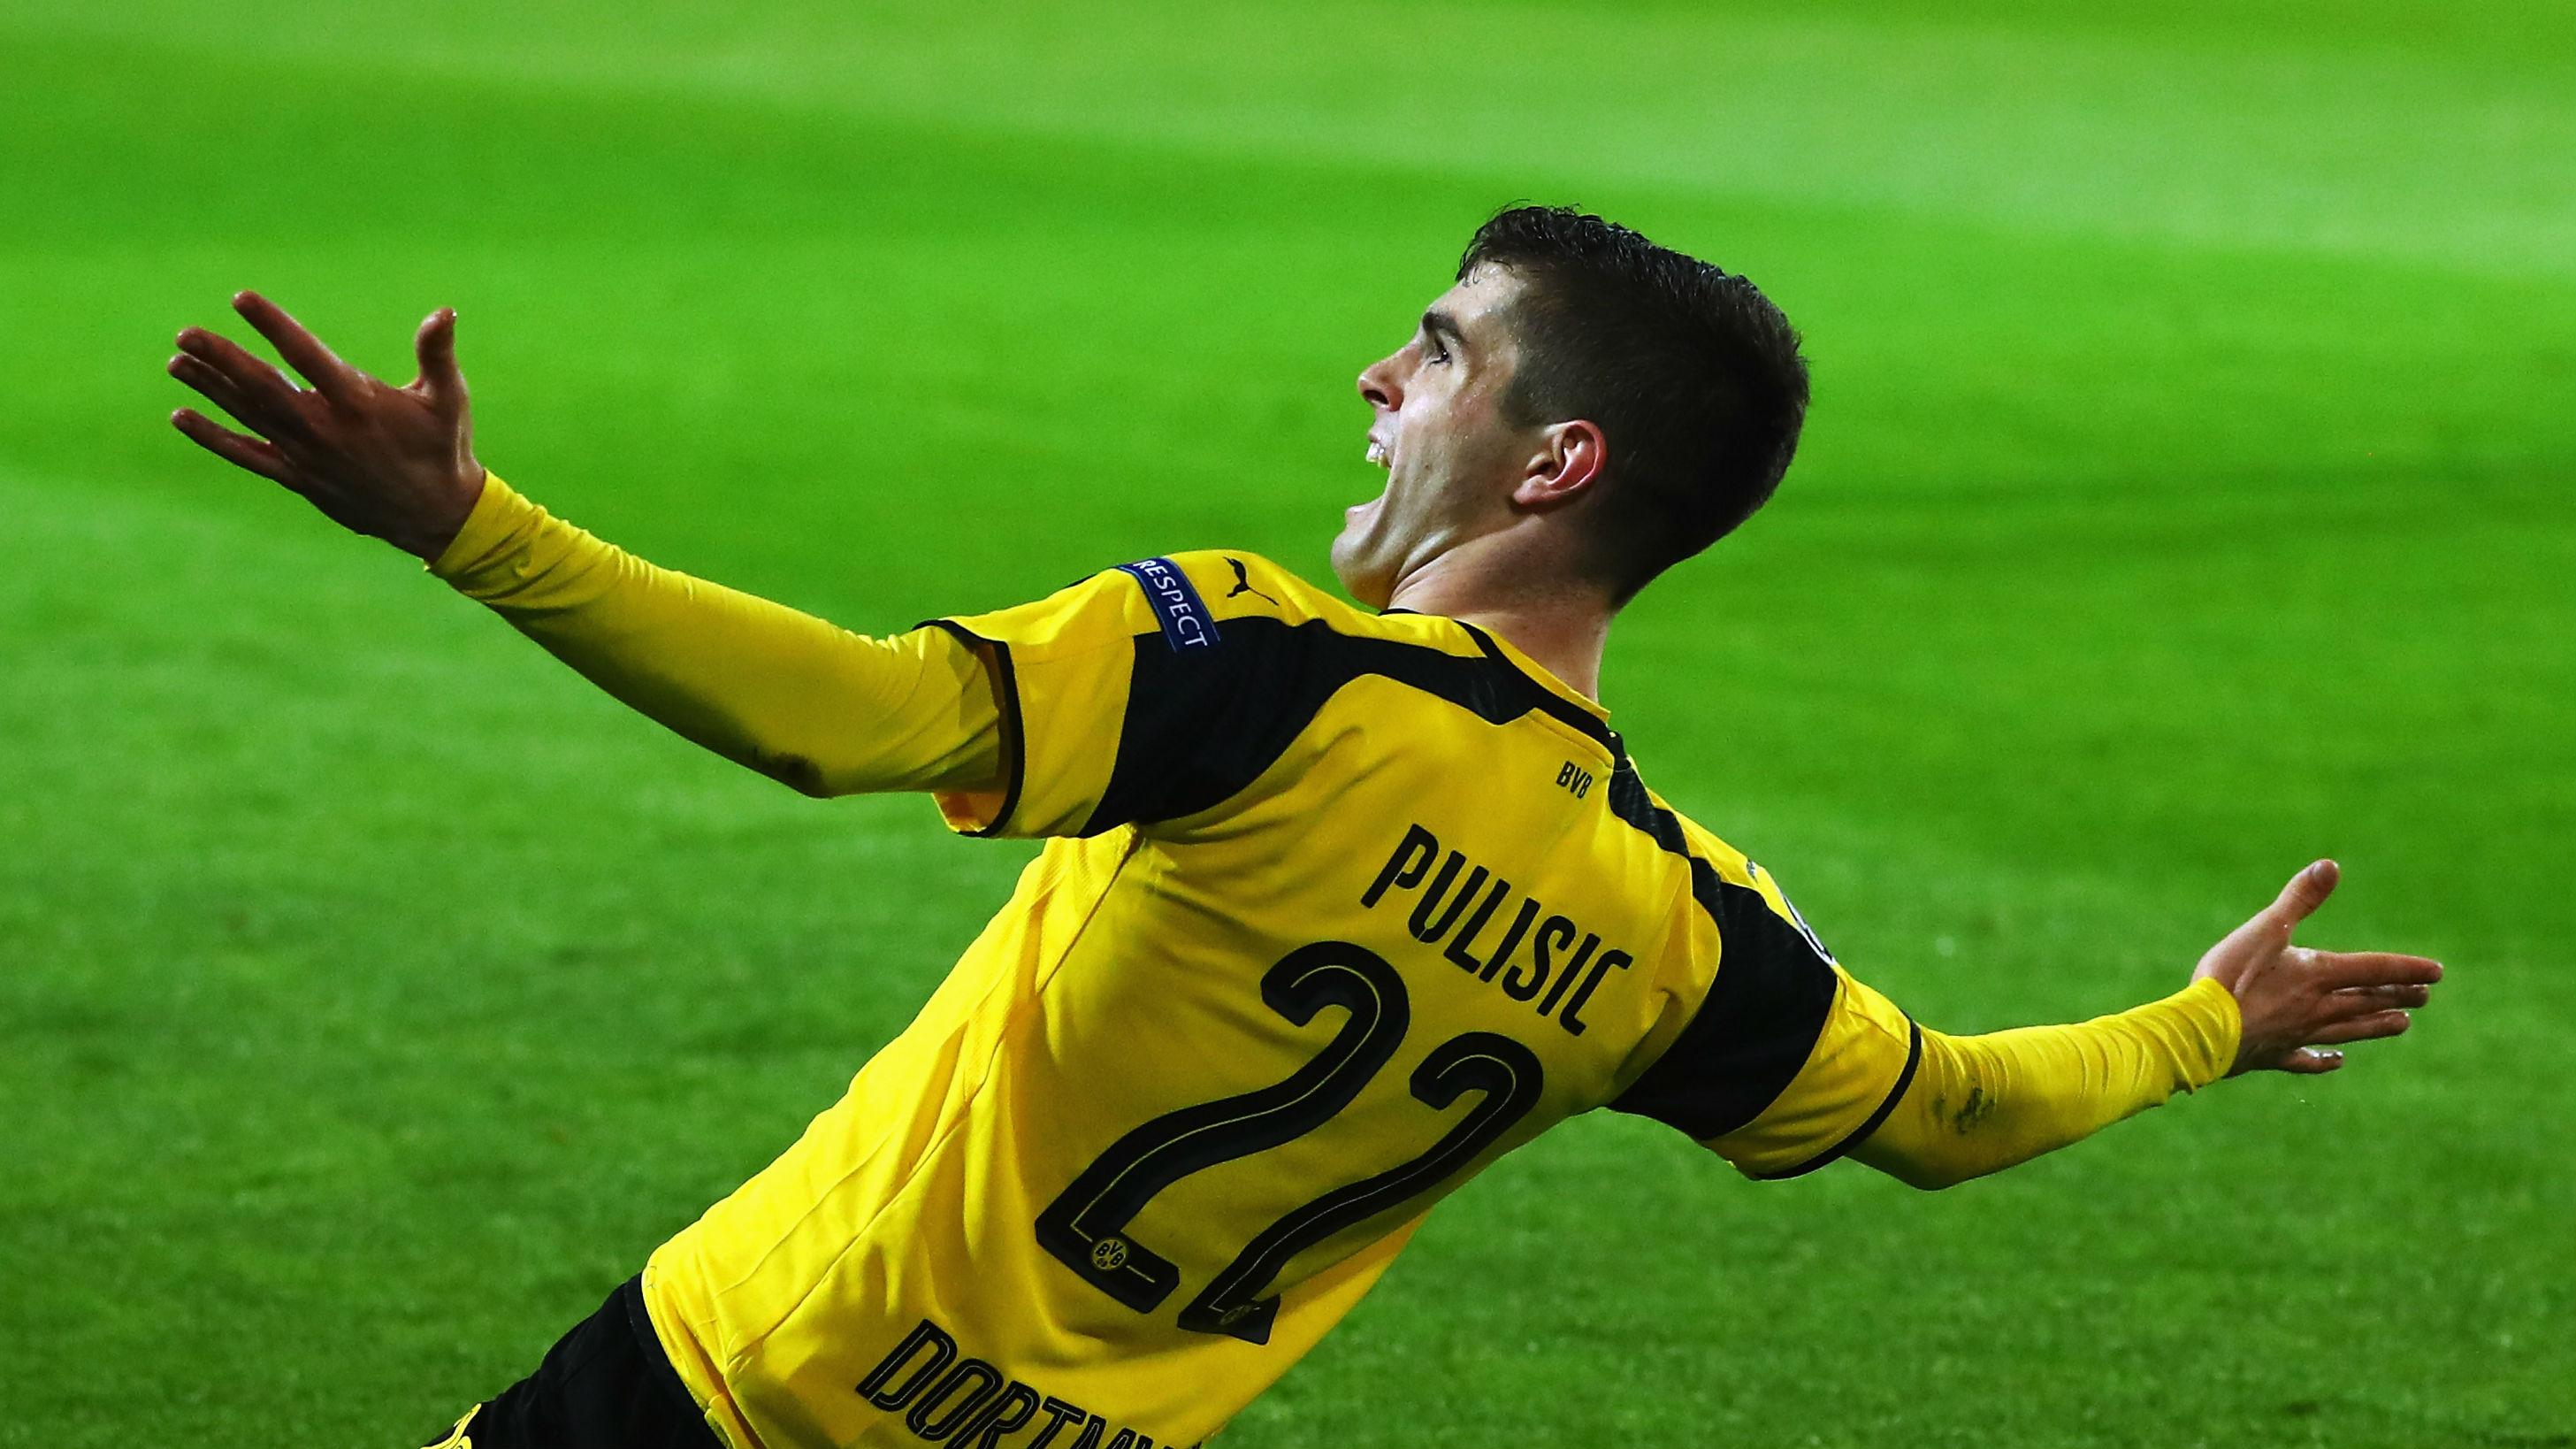 Lothar Matthaus Encourages Bayern Munich to Tar Christian